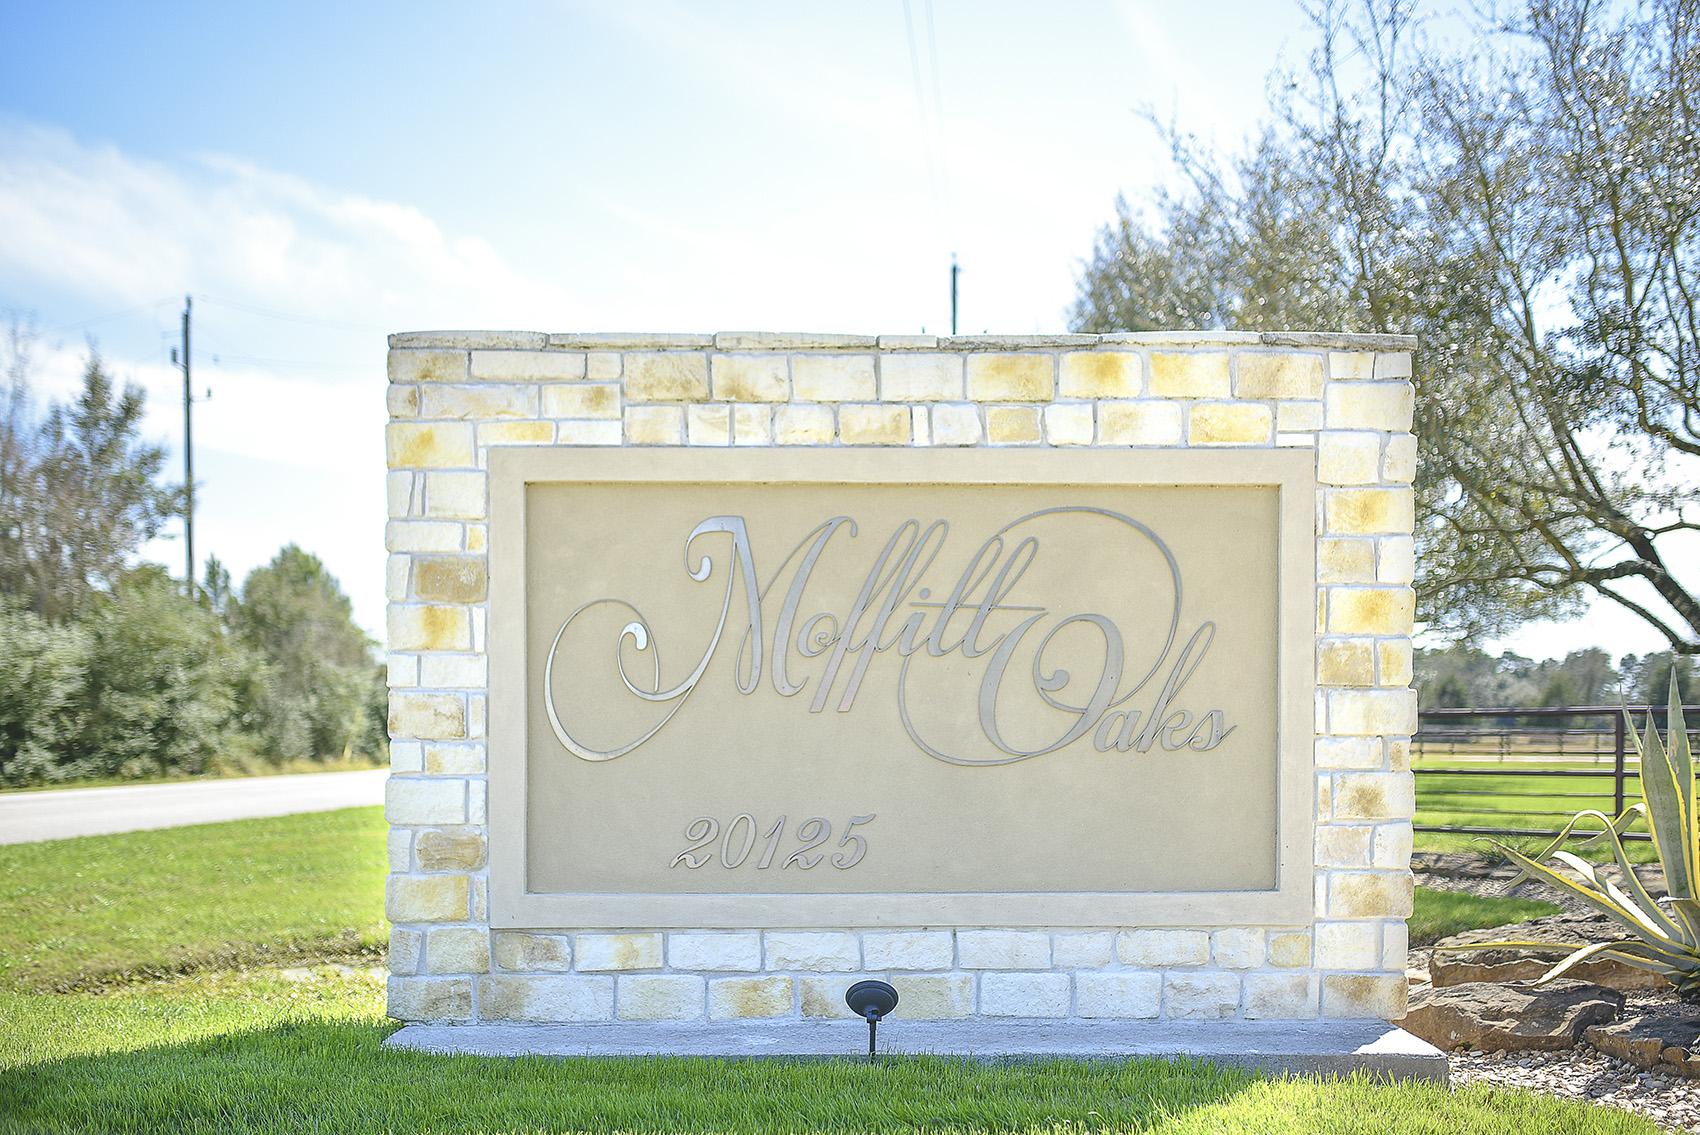 tomball-texas-wedding-photographer-venue-sign-20125